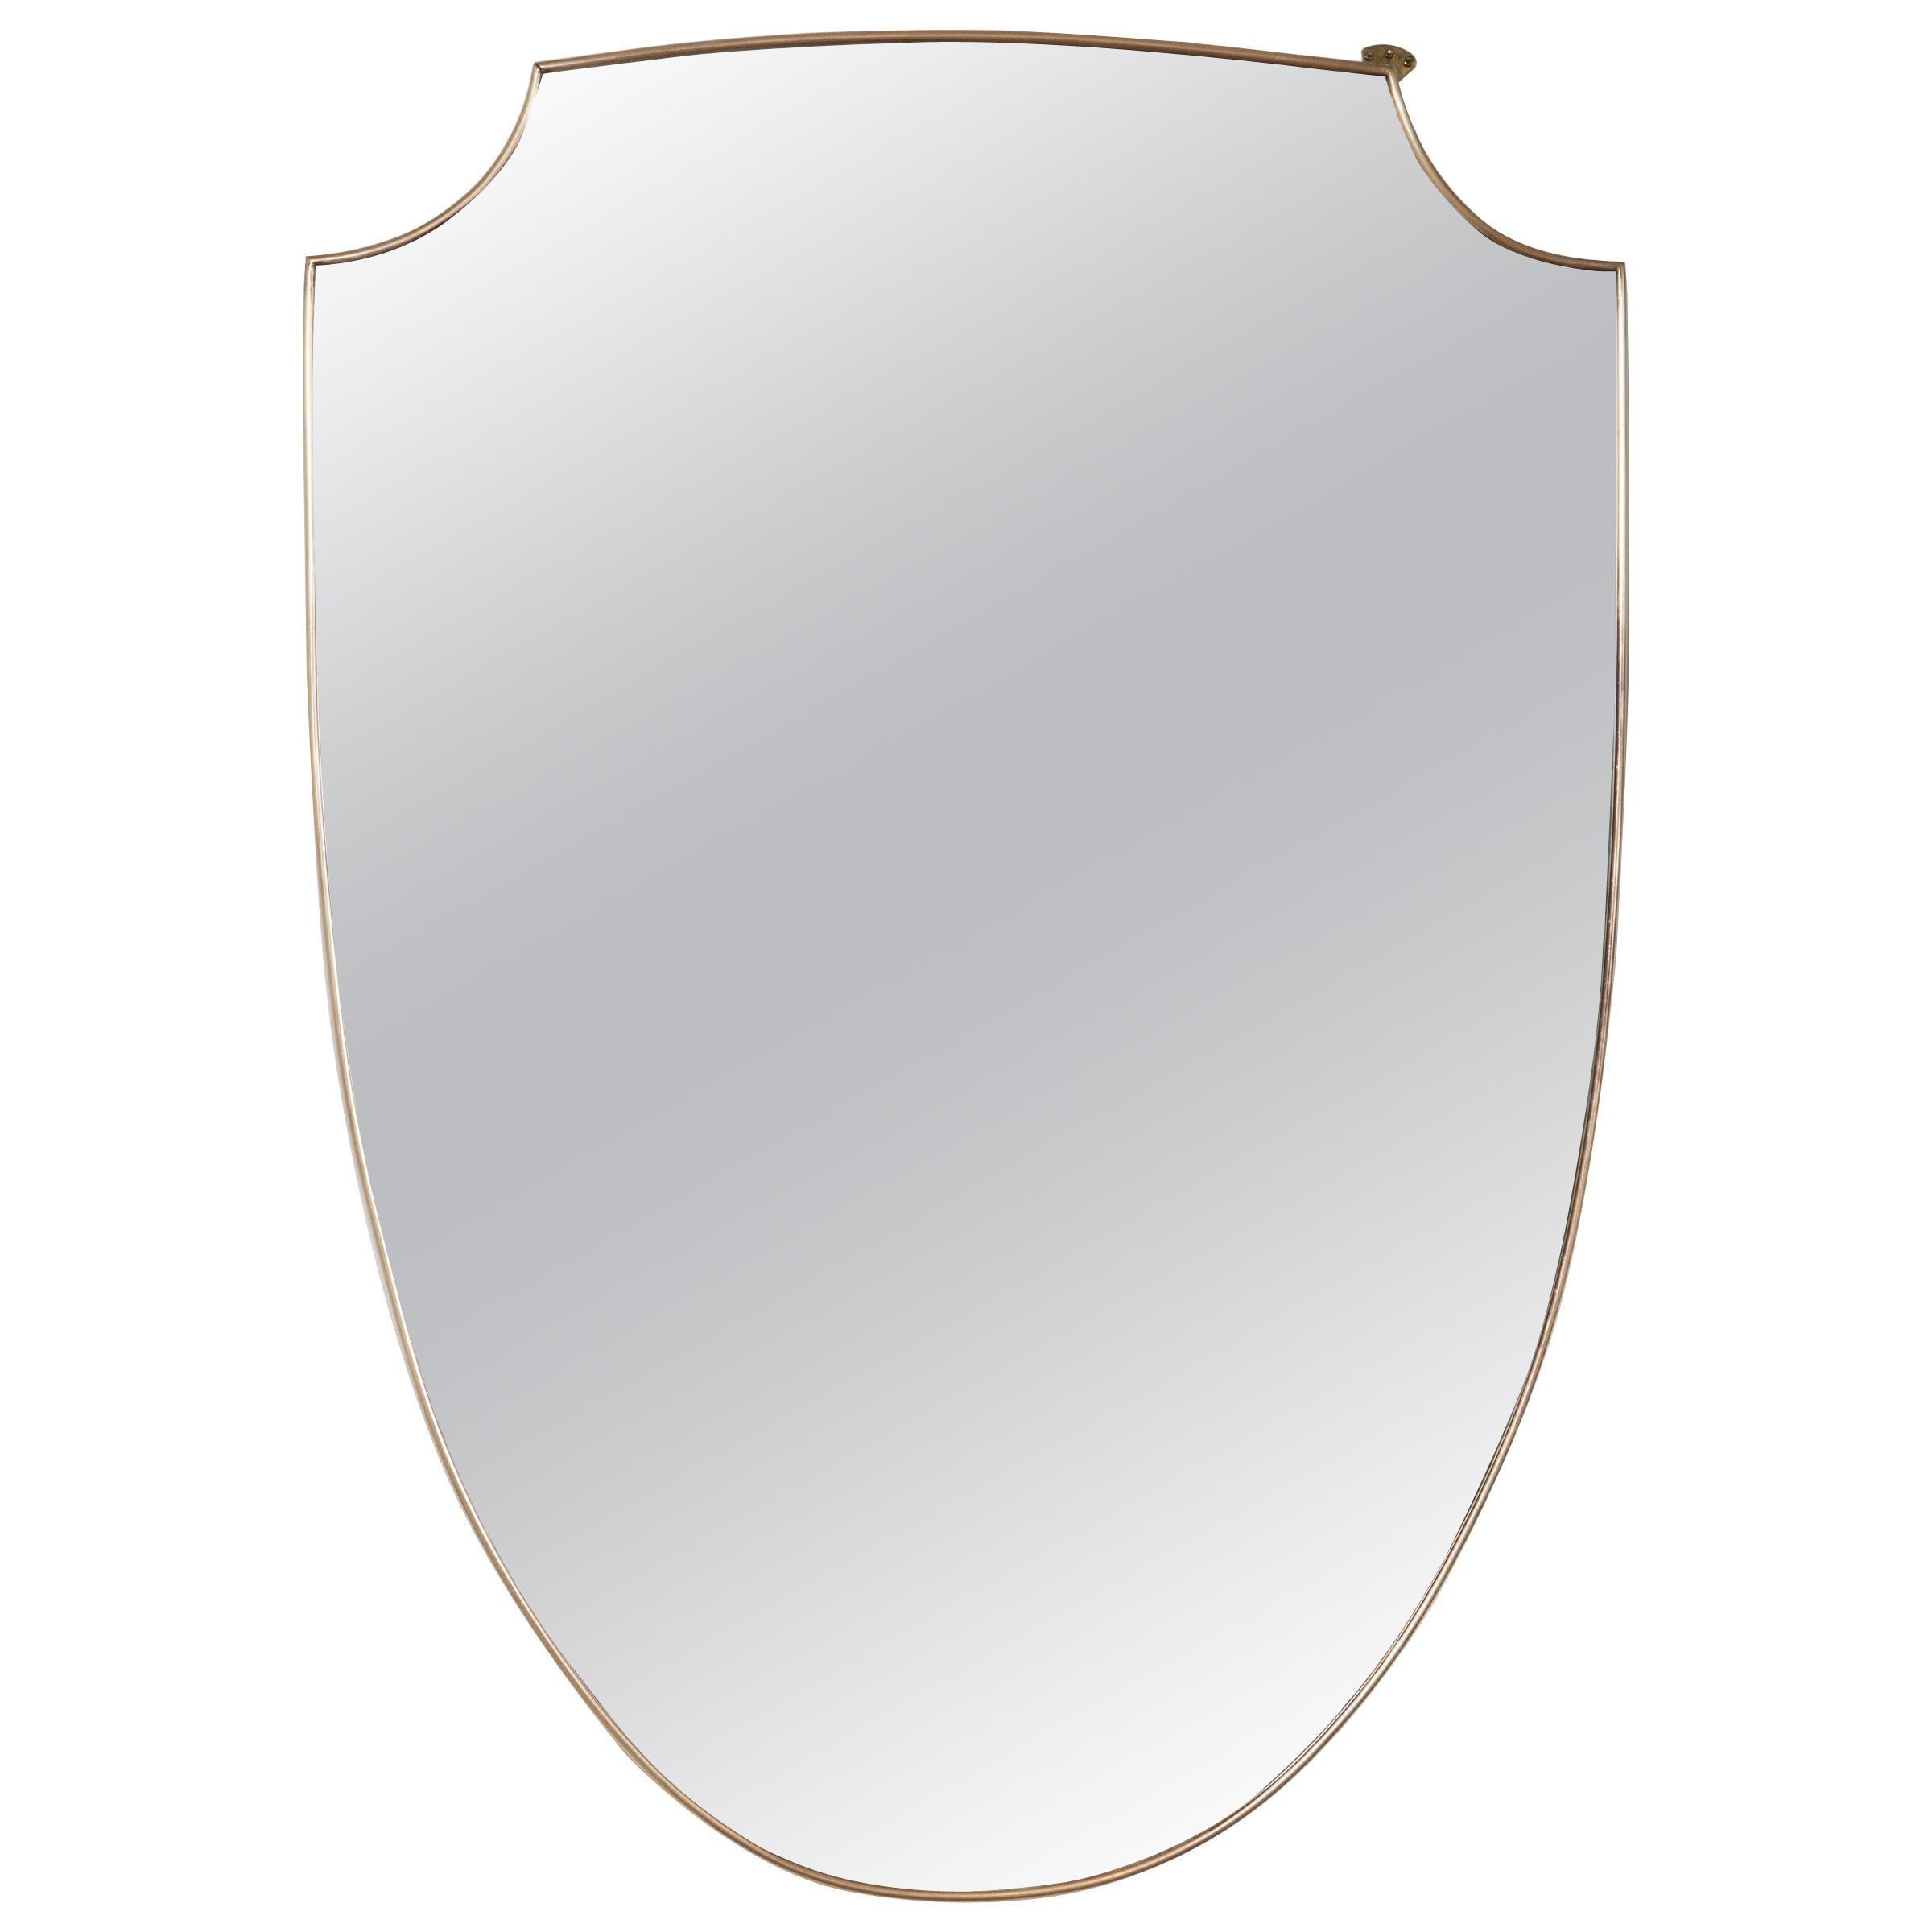 Large Pair of Mid Century Italian Design Shield-Shaped Mirrors, Gio Ponti Style